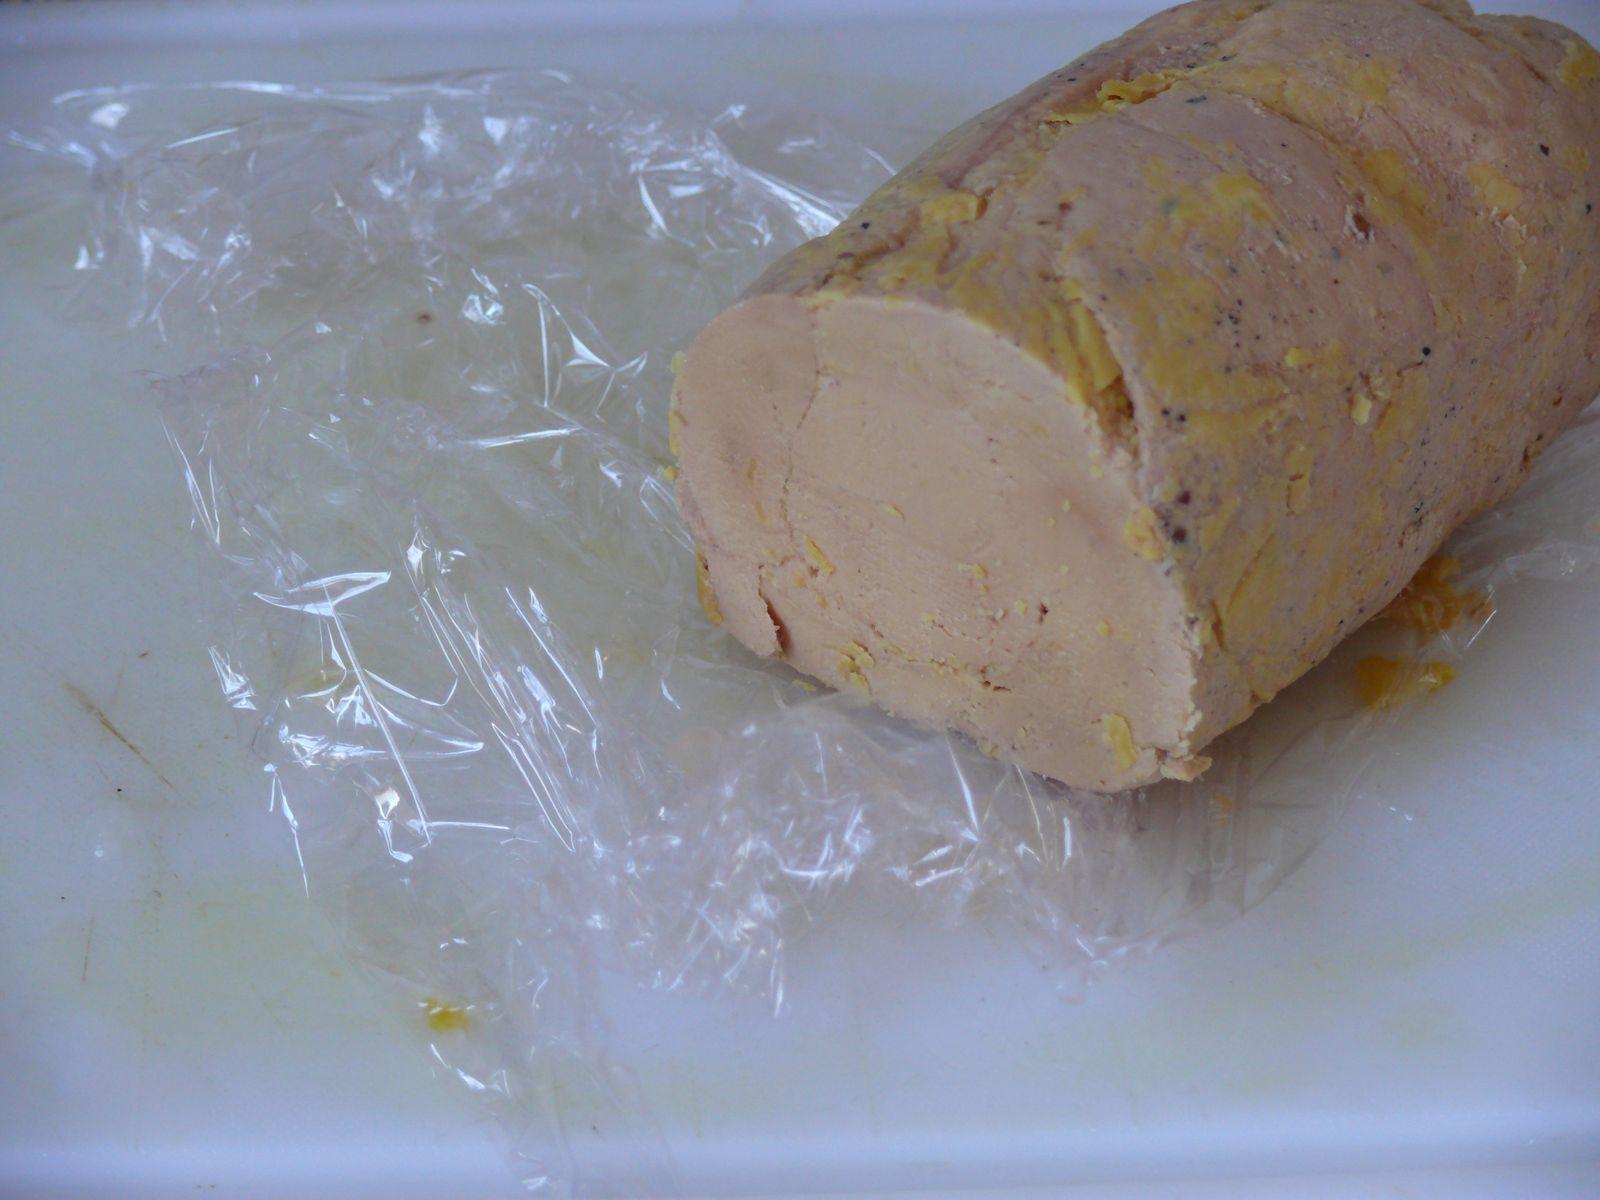 http://idata.over-blog.com/2/61/31/50/Entr-es-froides-ou-chaudes/axane-equil-soupe-betterave-FG-009.JPG